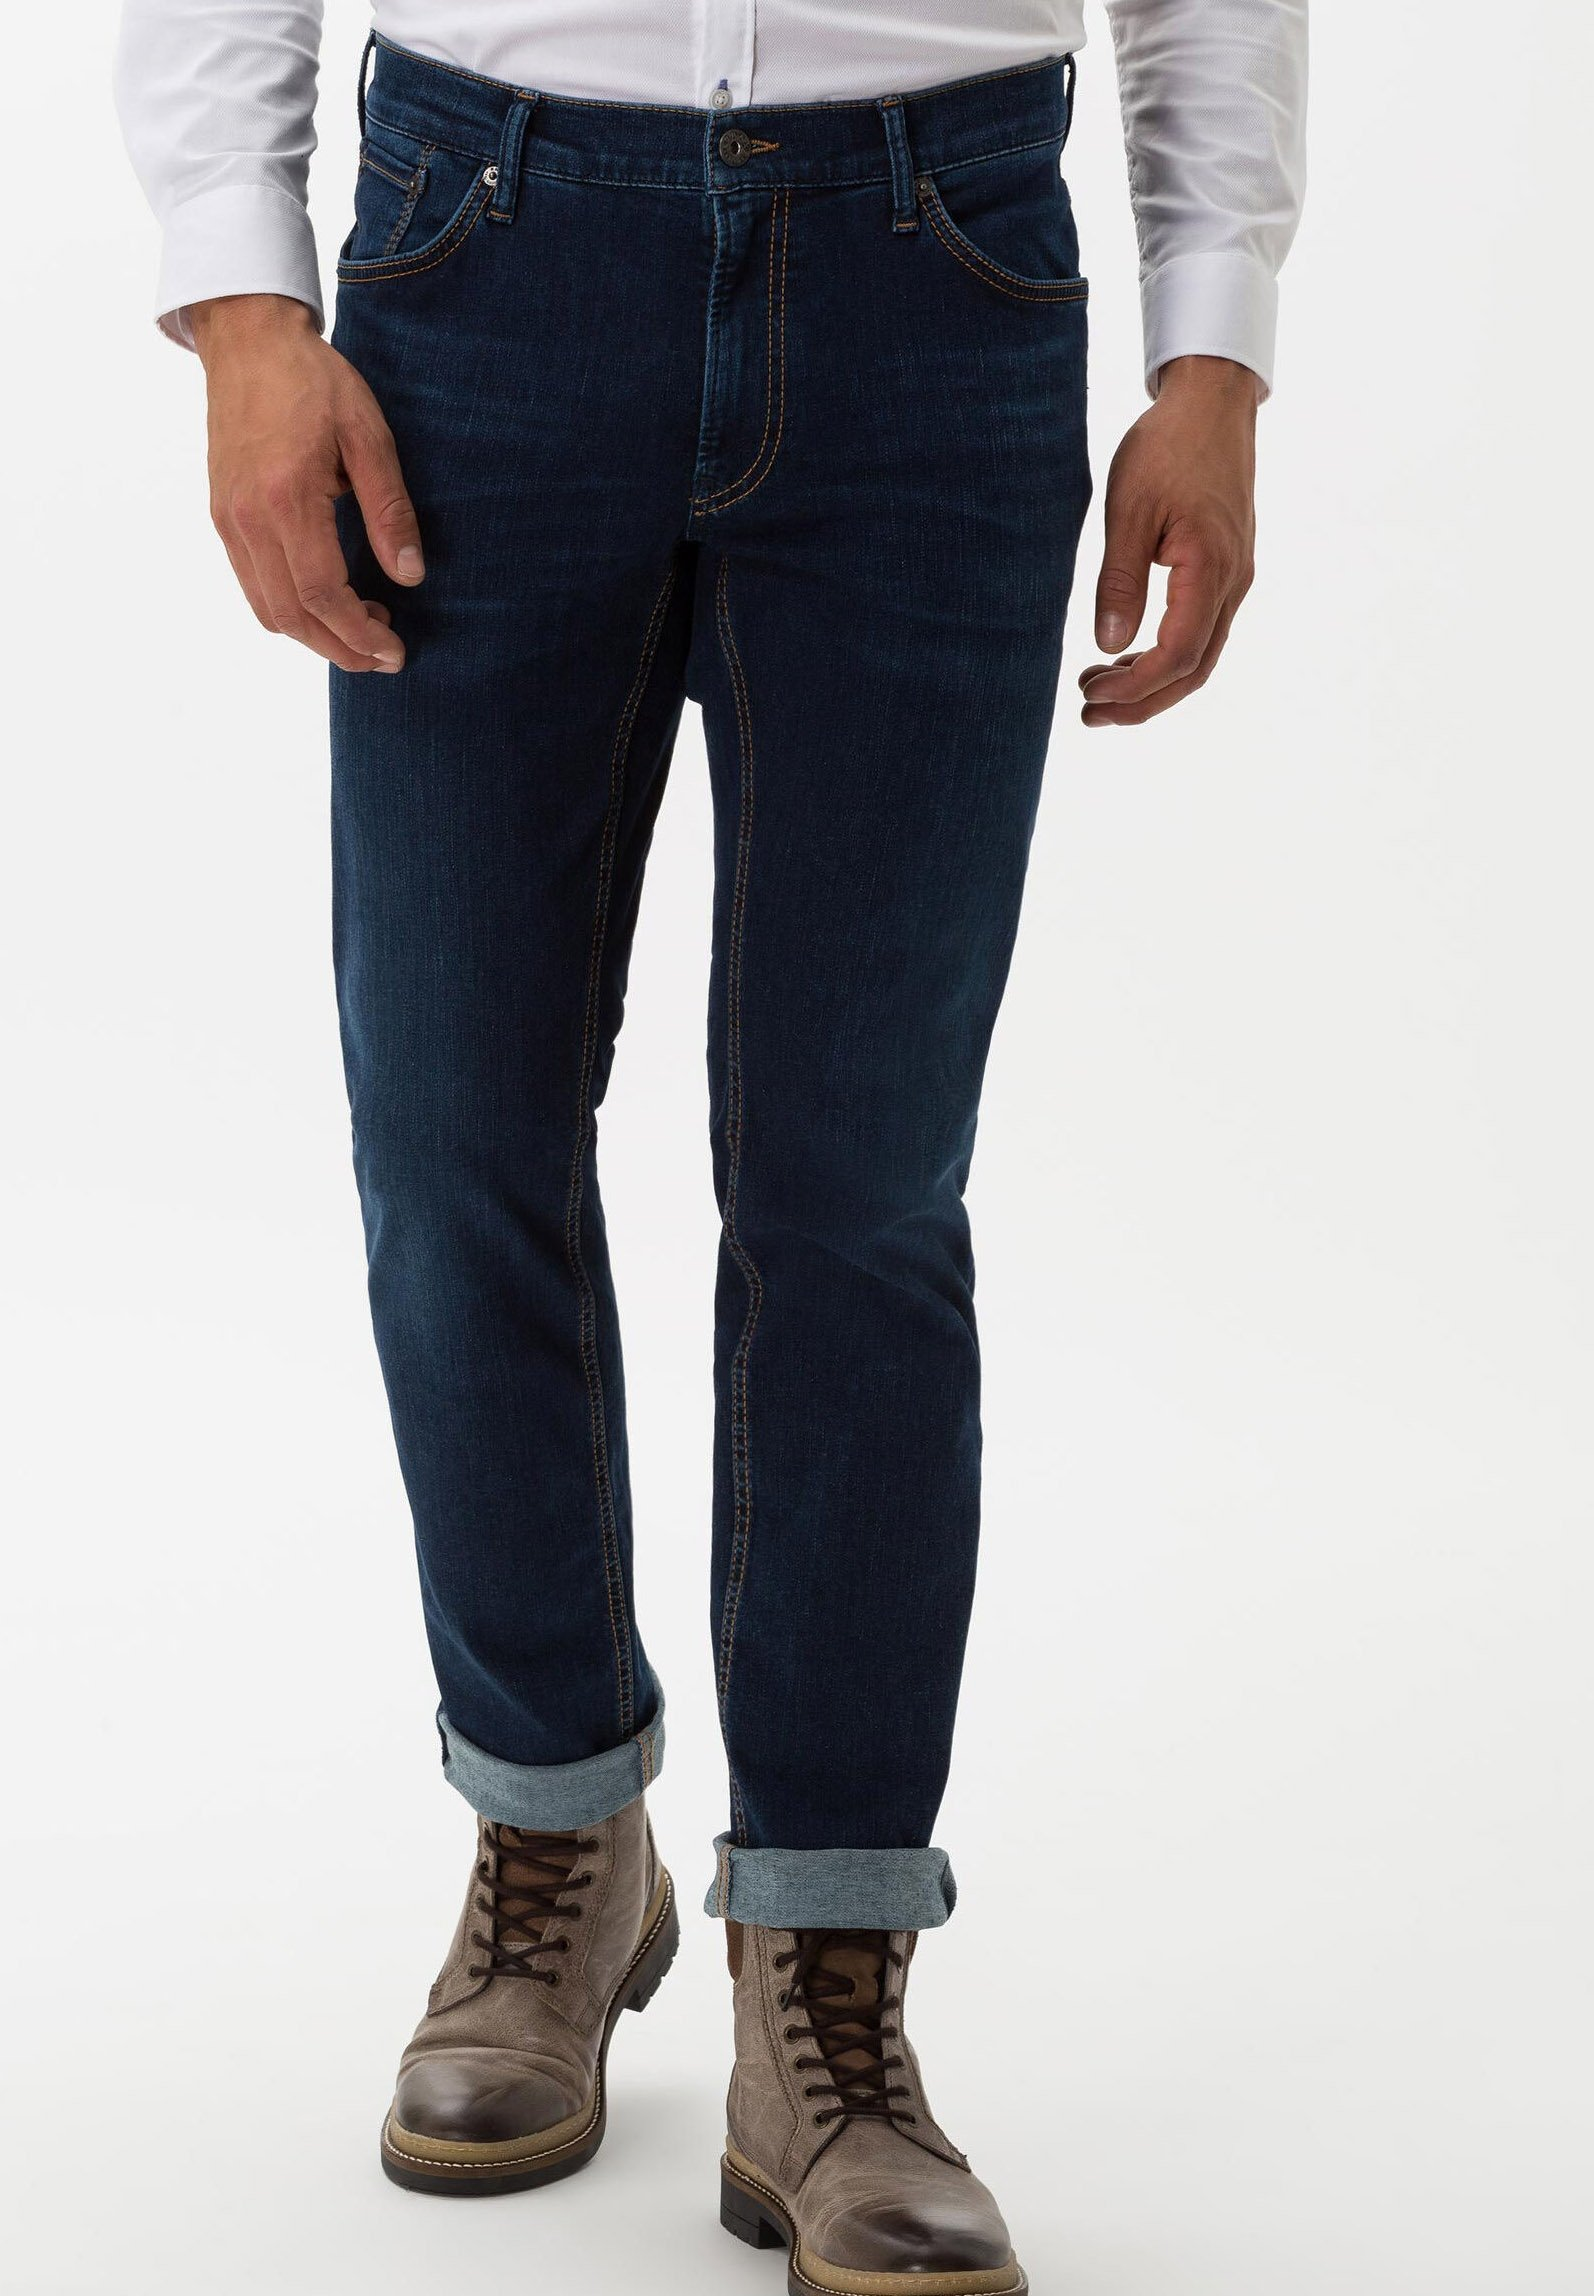 Uomo STYLE CHUCK - Jeans slim fit - stone blue